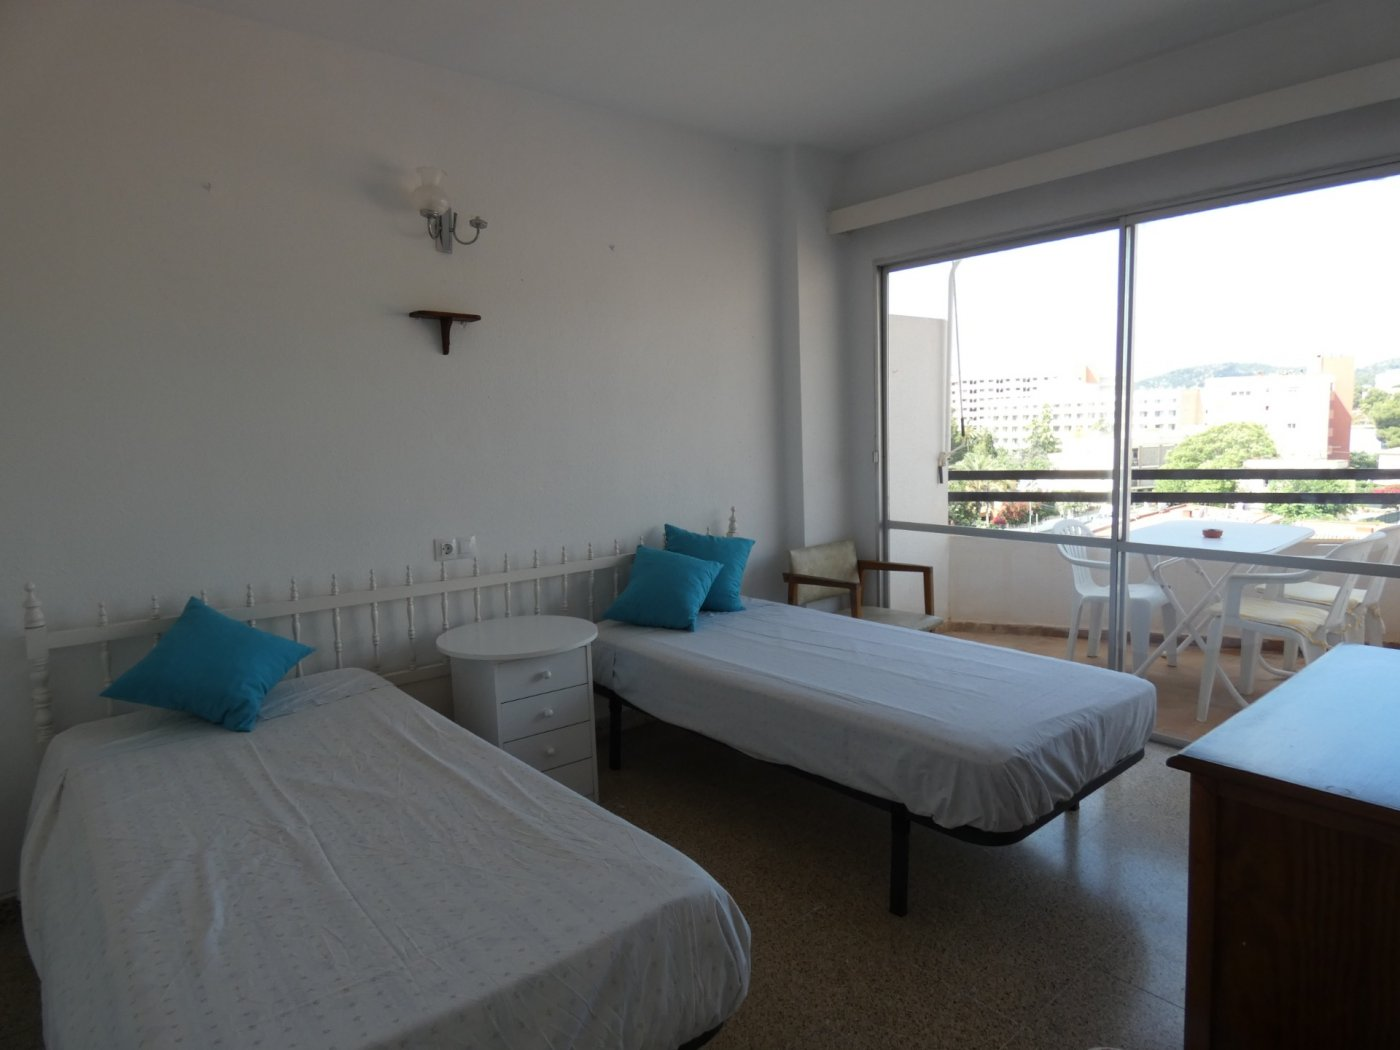 Maravilloso alquiler apartamento en son caliu!!!!! - imagenInmueble7